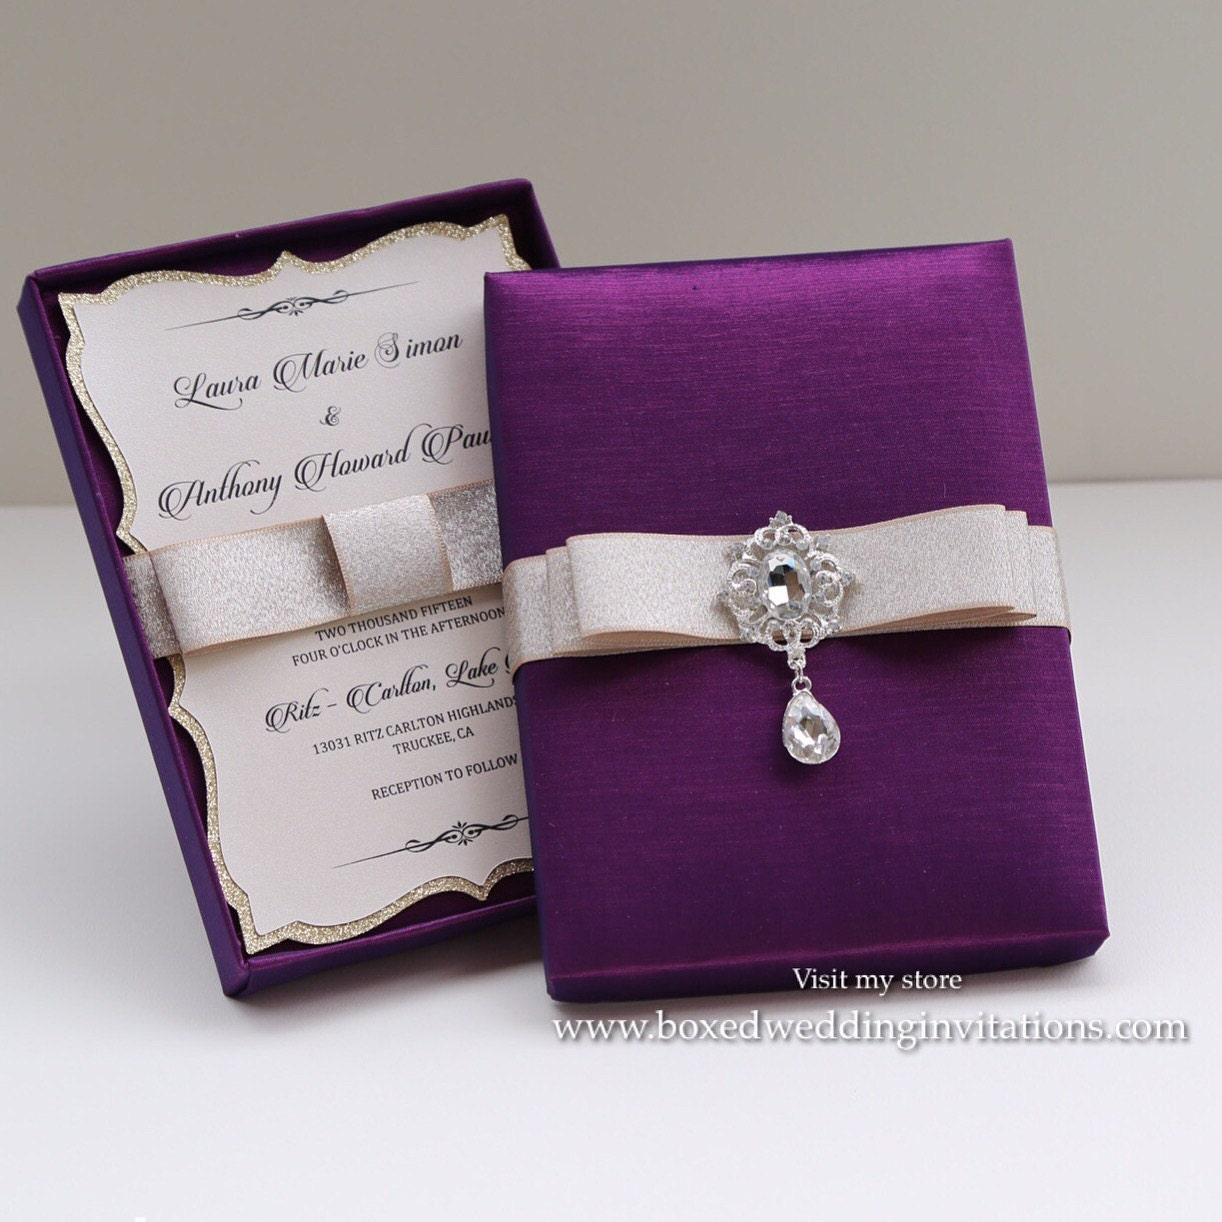 Box Wedding Invitations